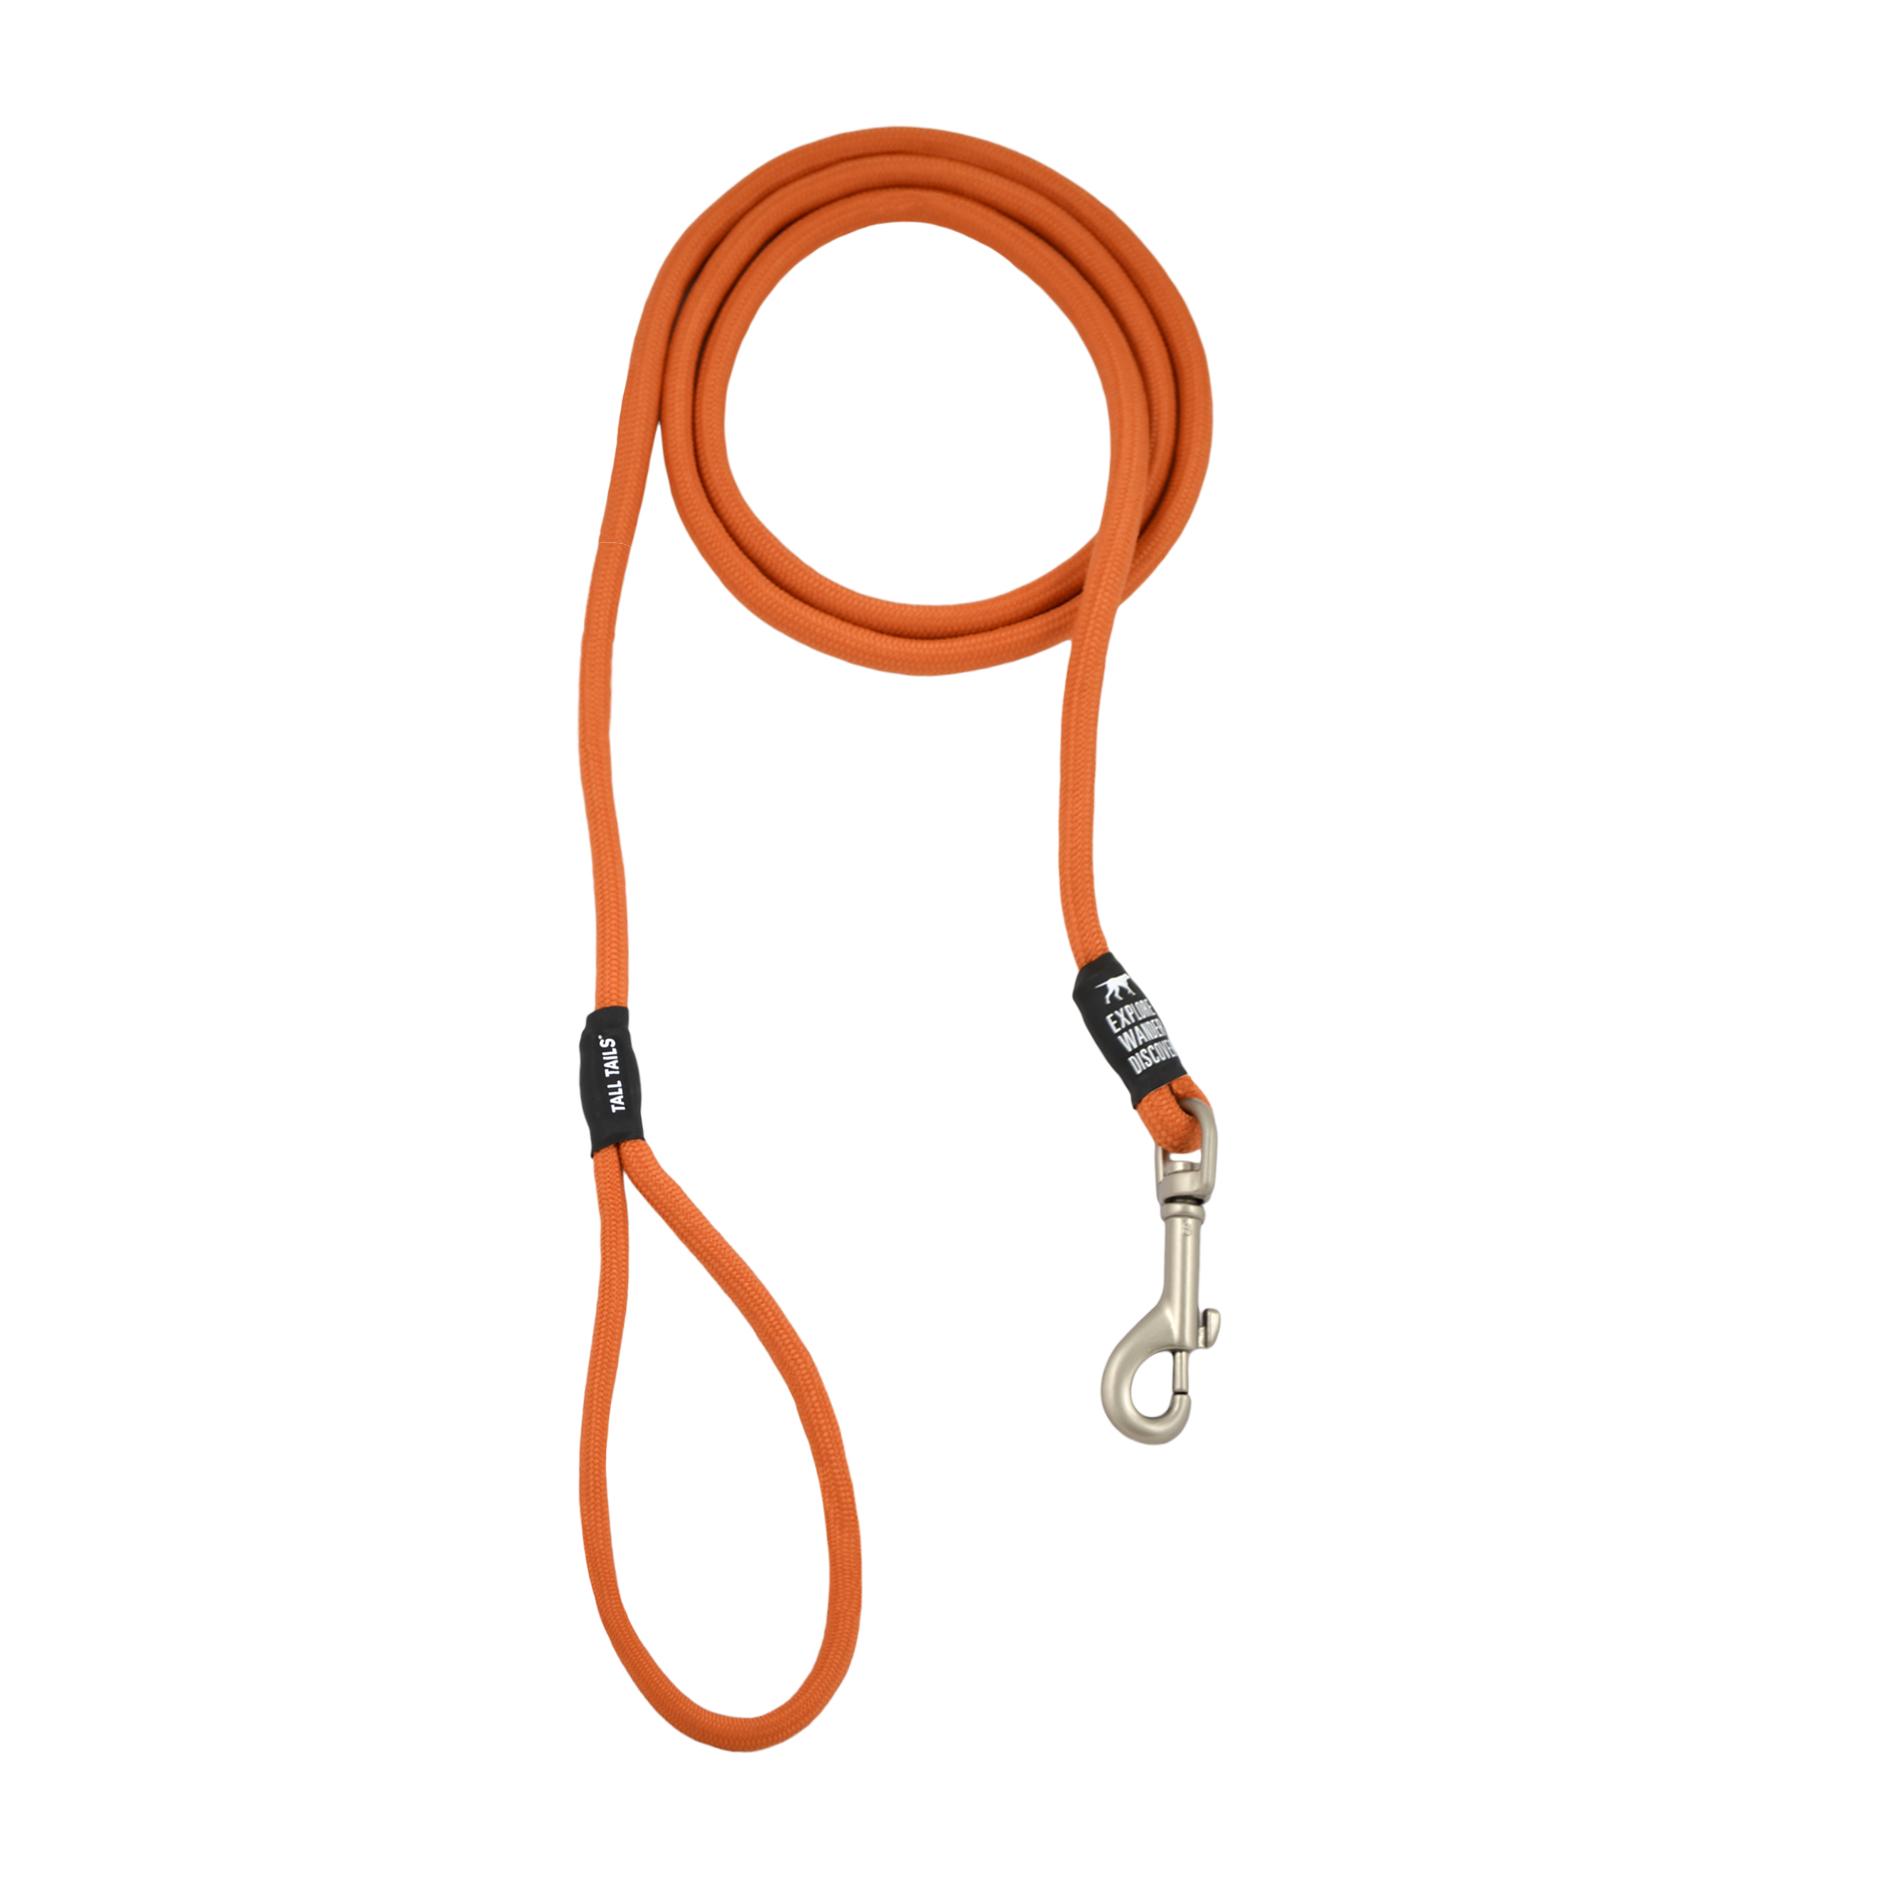 Tall Tails Rope Dog Leash, Orange, Over 50-lb